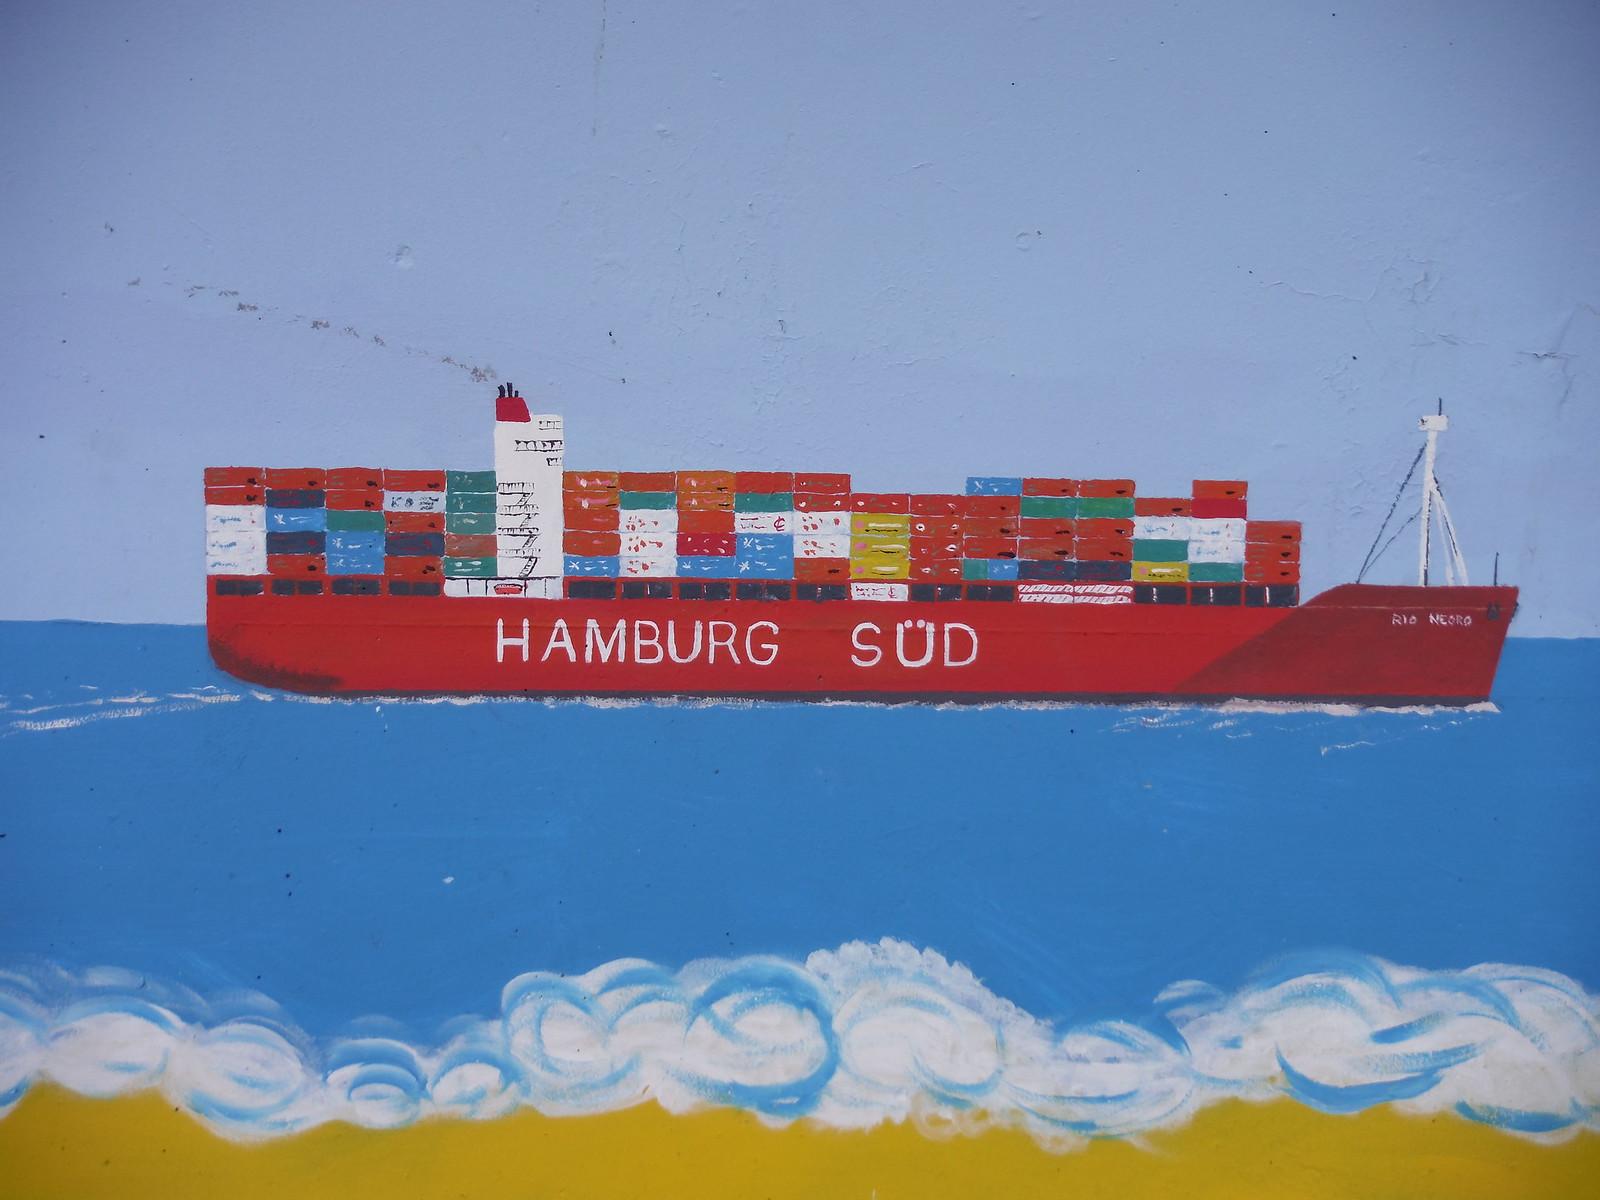 Hamburg-Süd mural, Concord Beach, Canvey Island SWC Walk 258 Benfleet Circular (via Canvey Island)